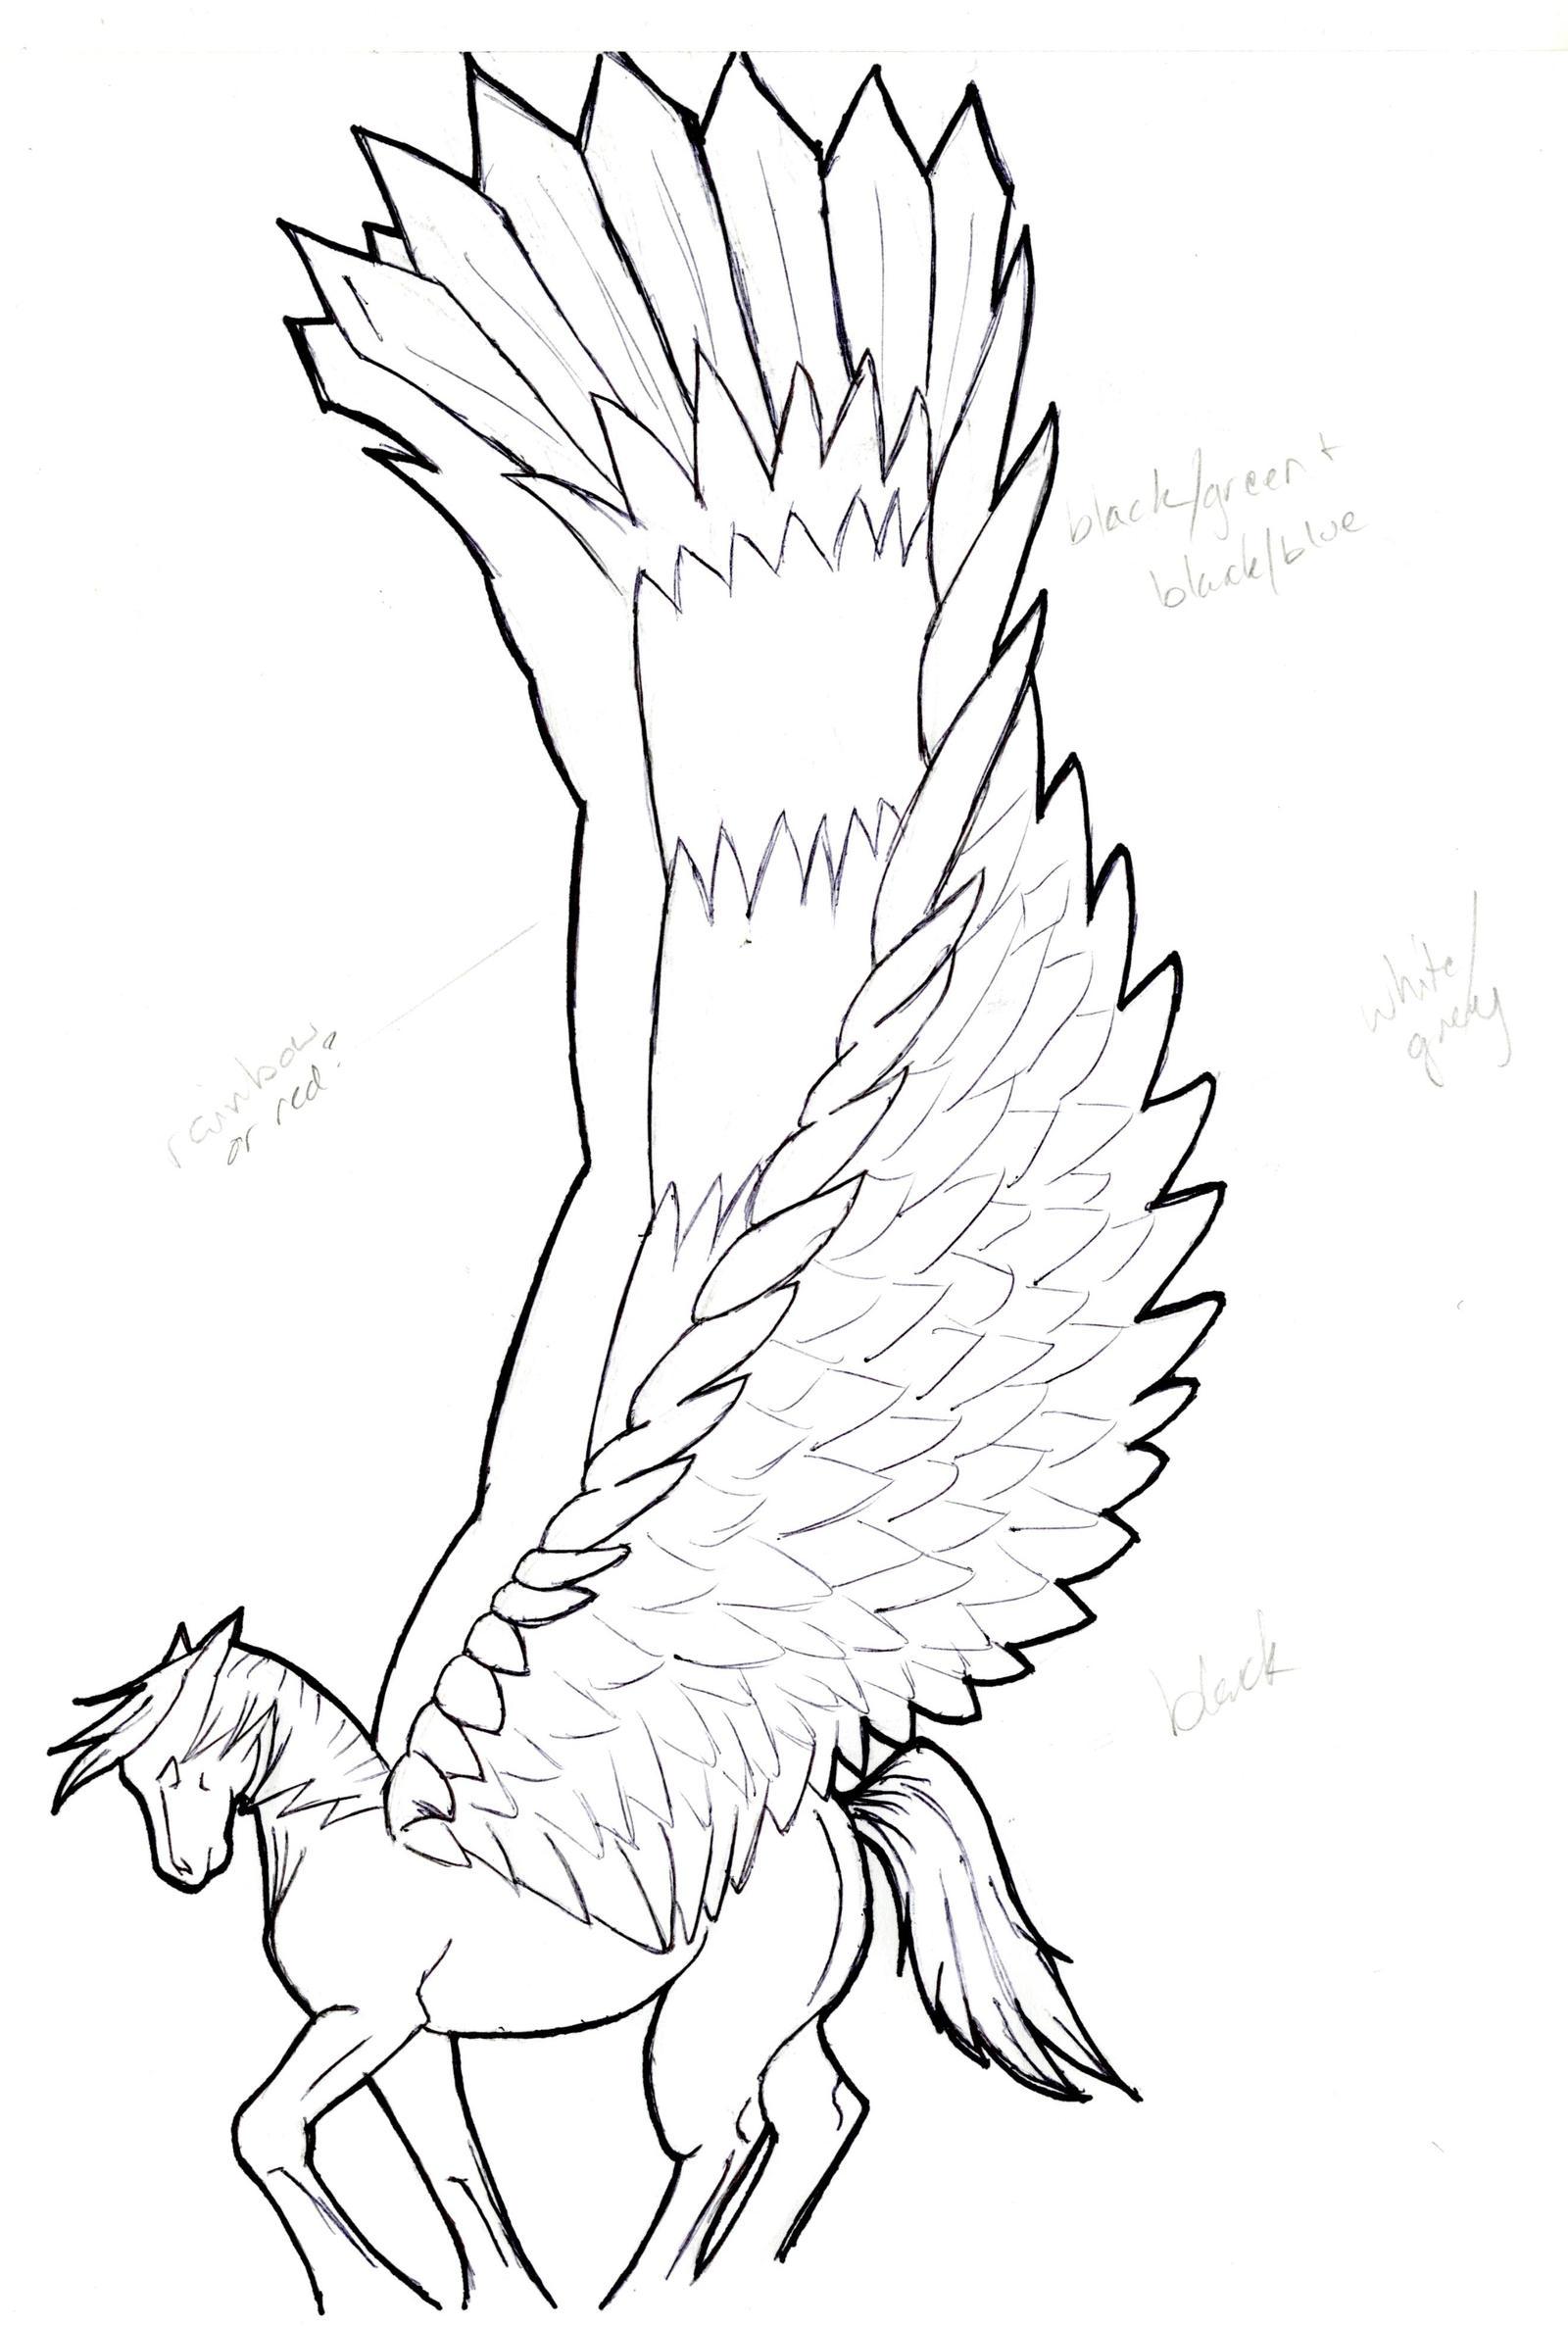 pegasus sketch by sparkpaw on deviantart